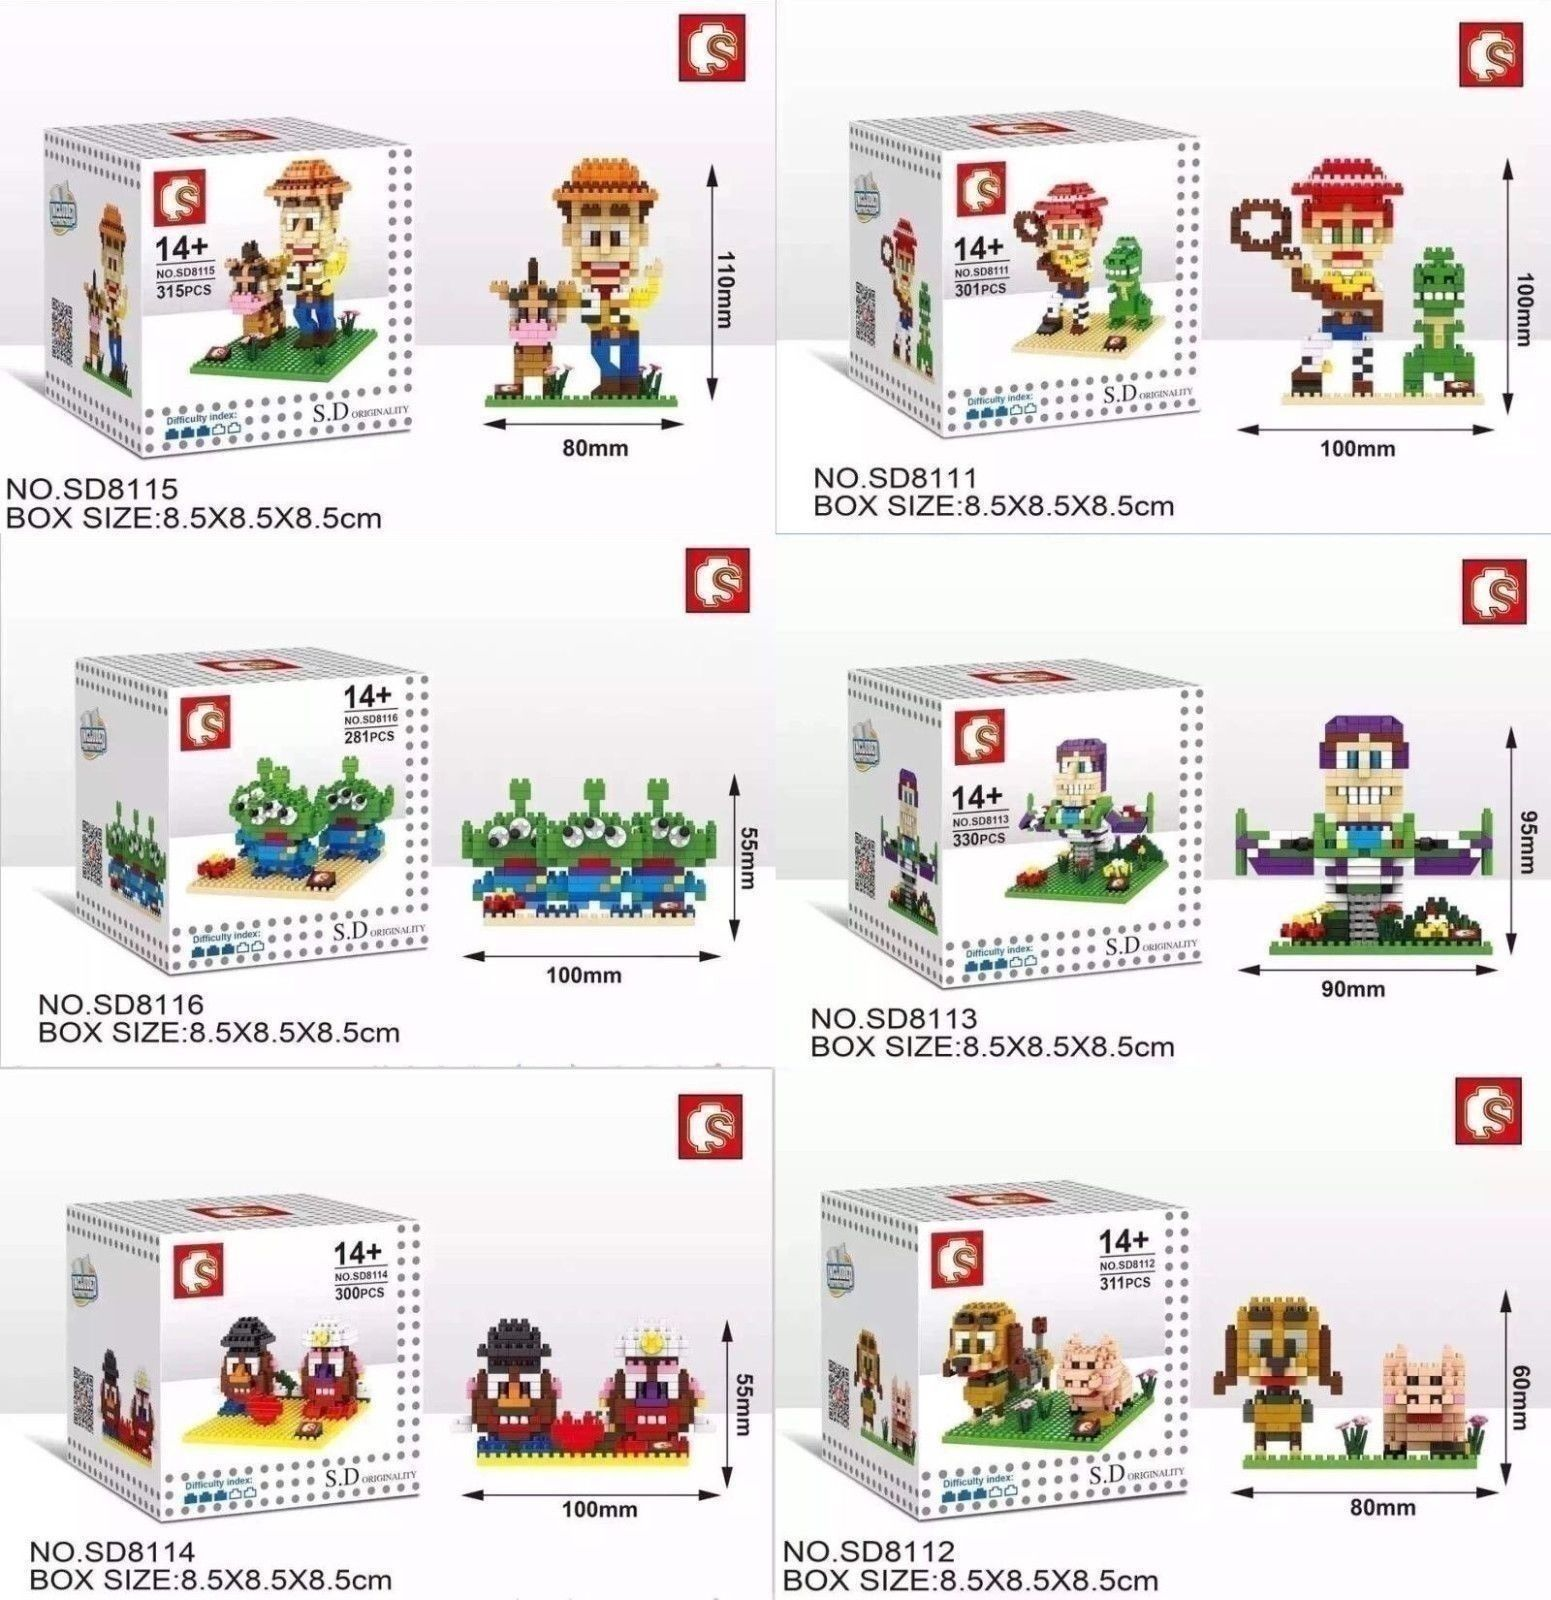 Toy Story Diy Building Blocks Disney Pixar Buzz Lightyear Woody Nanoblock 6 Sets